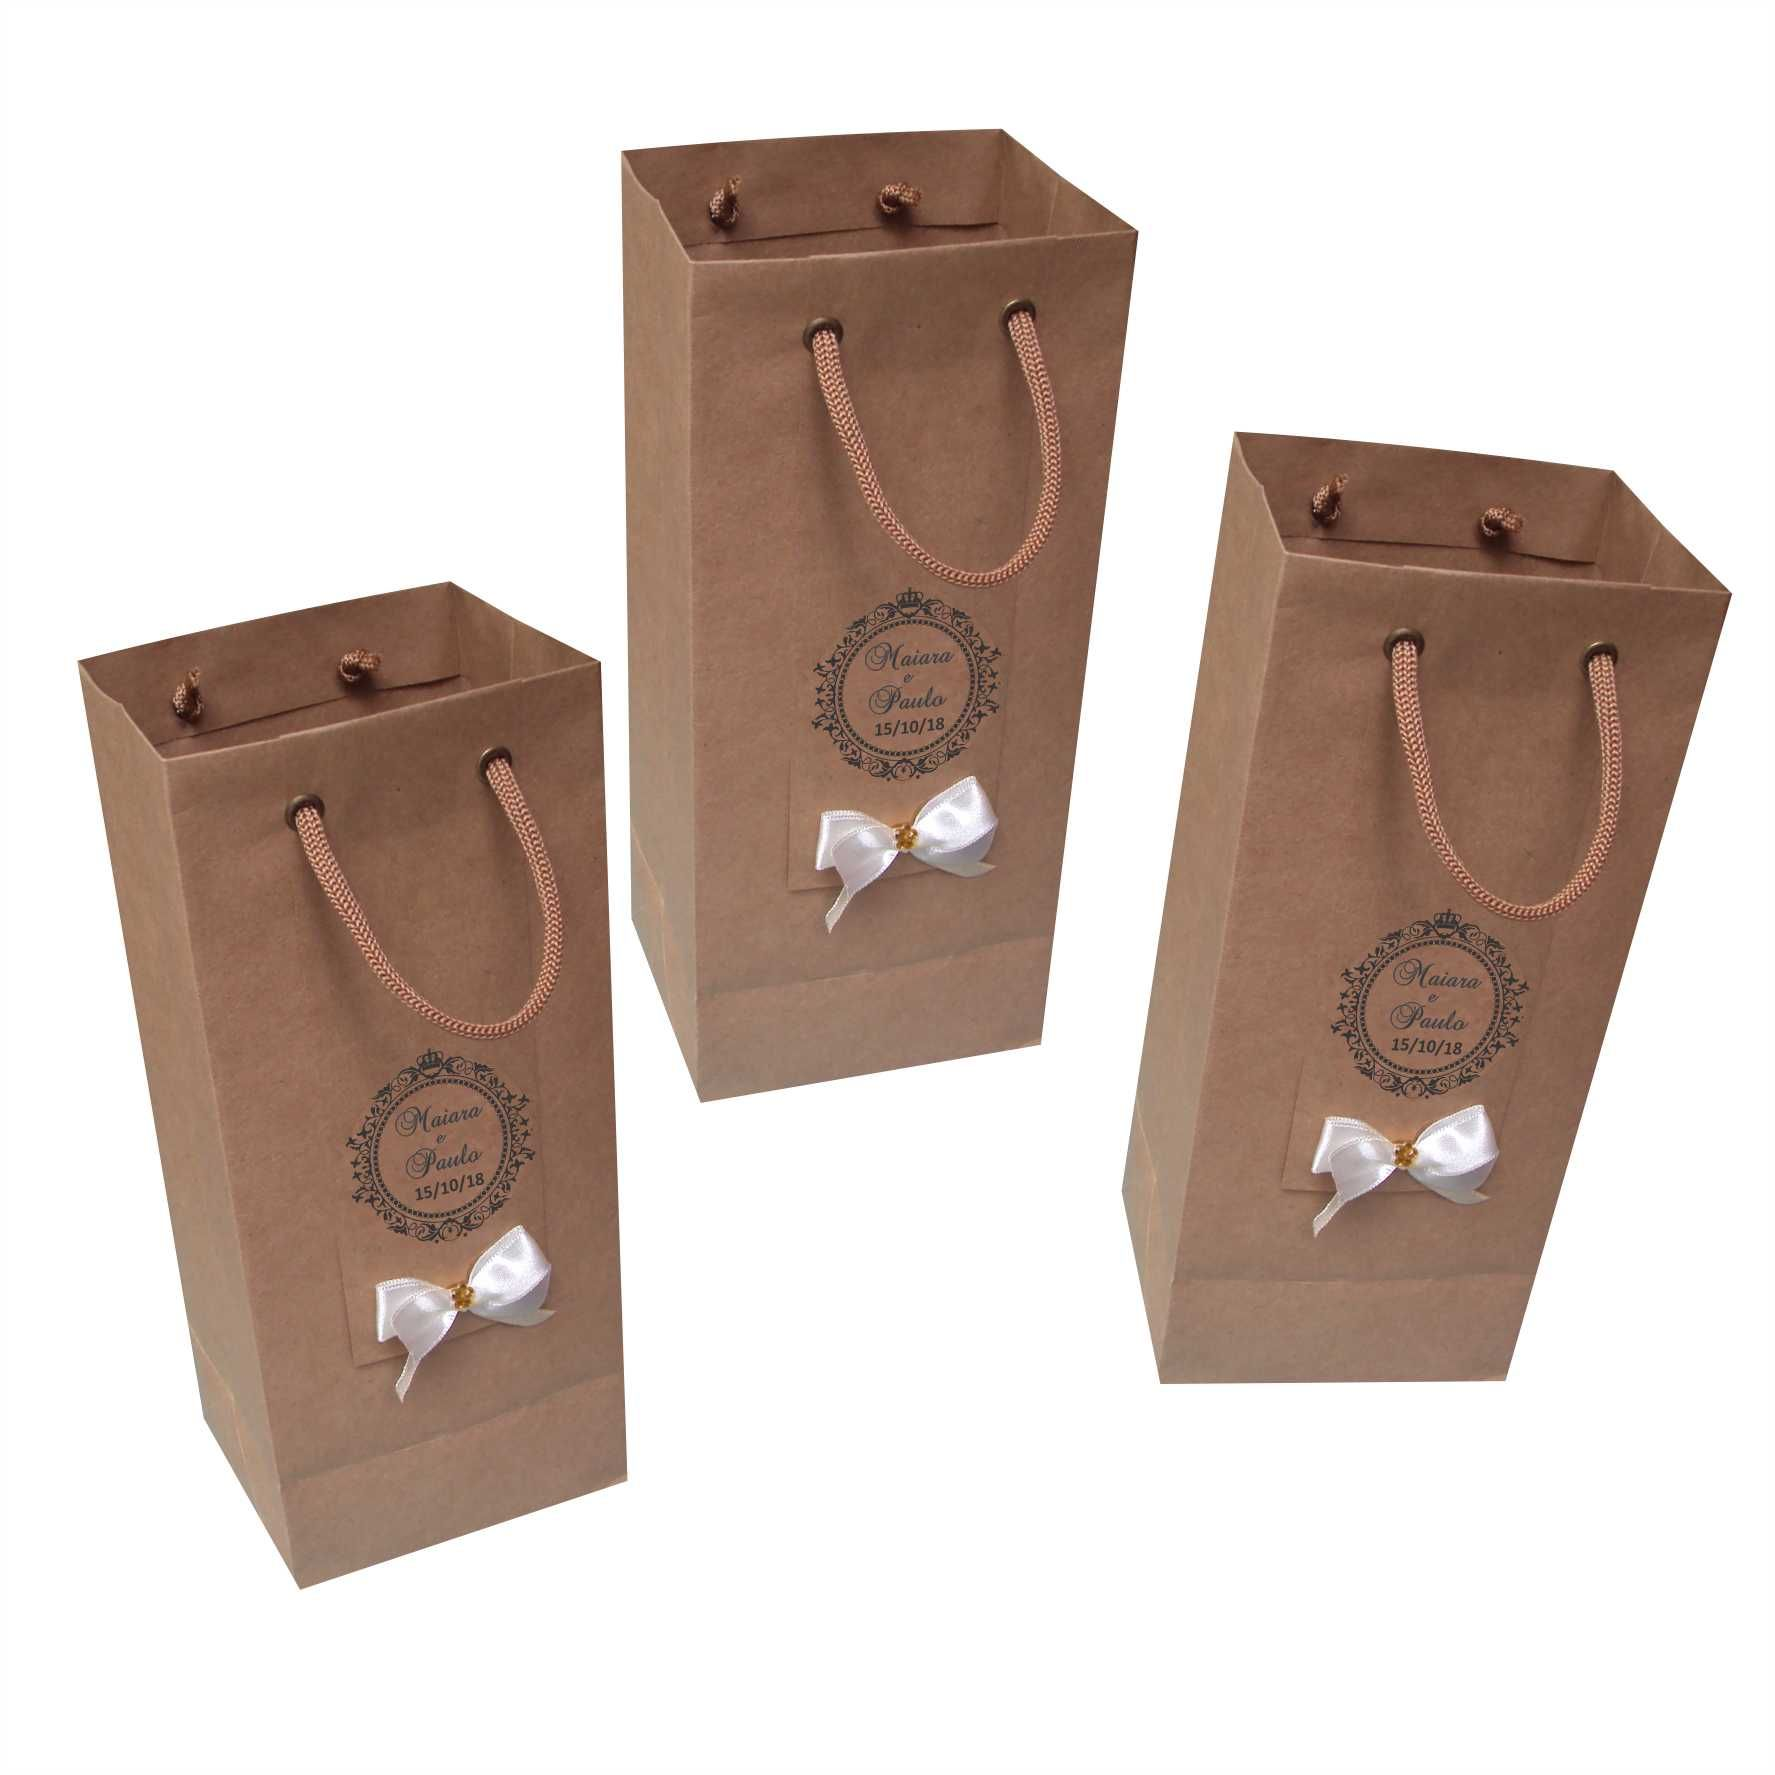 Sacola de papel kraft para mini garrafa - personalizada (11x23x9 cm) 15 unidades